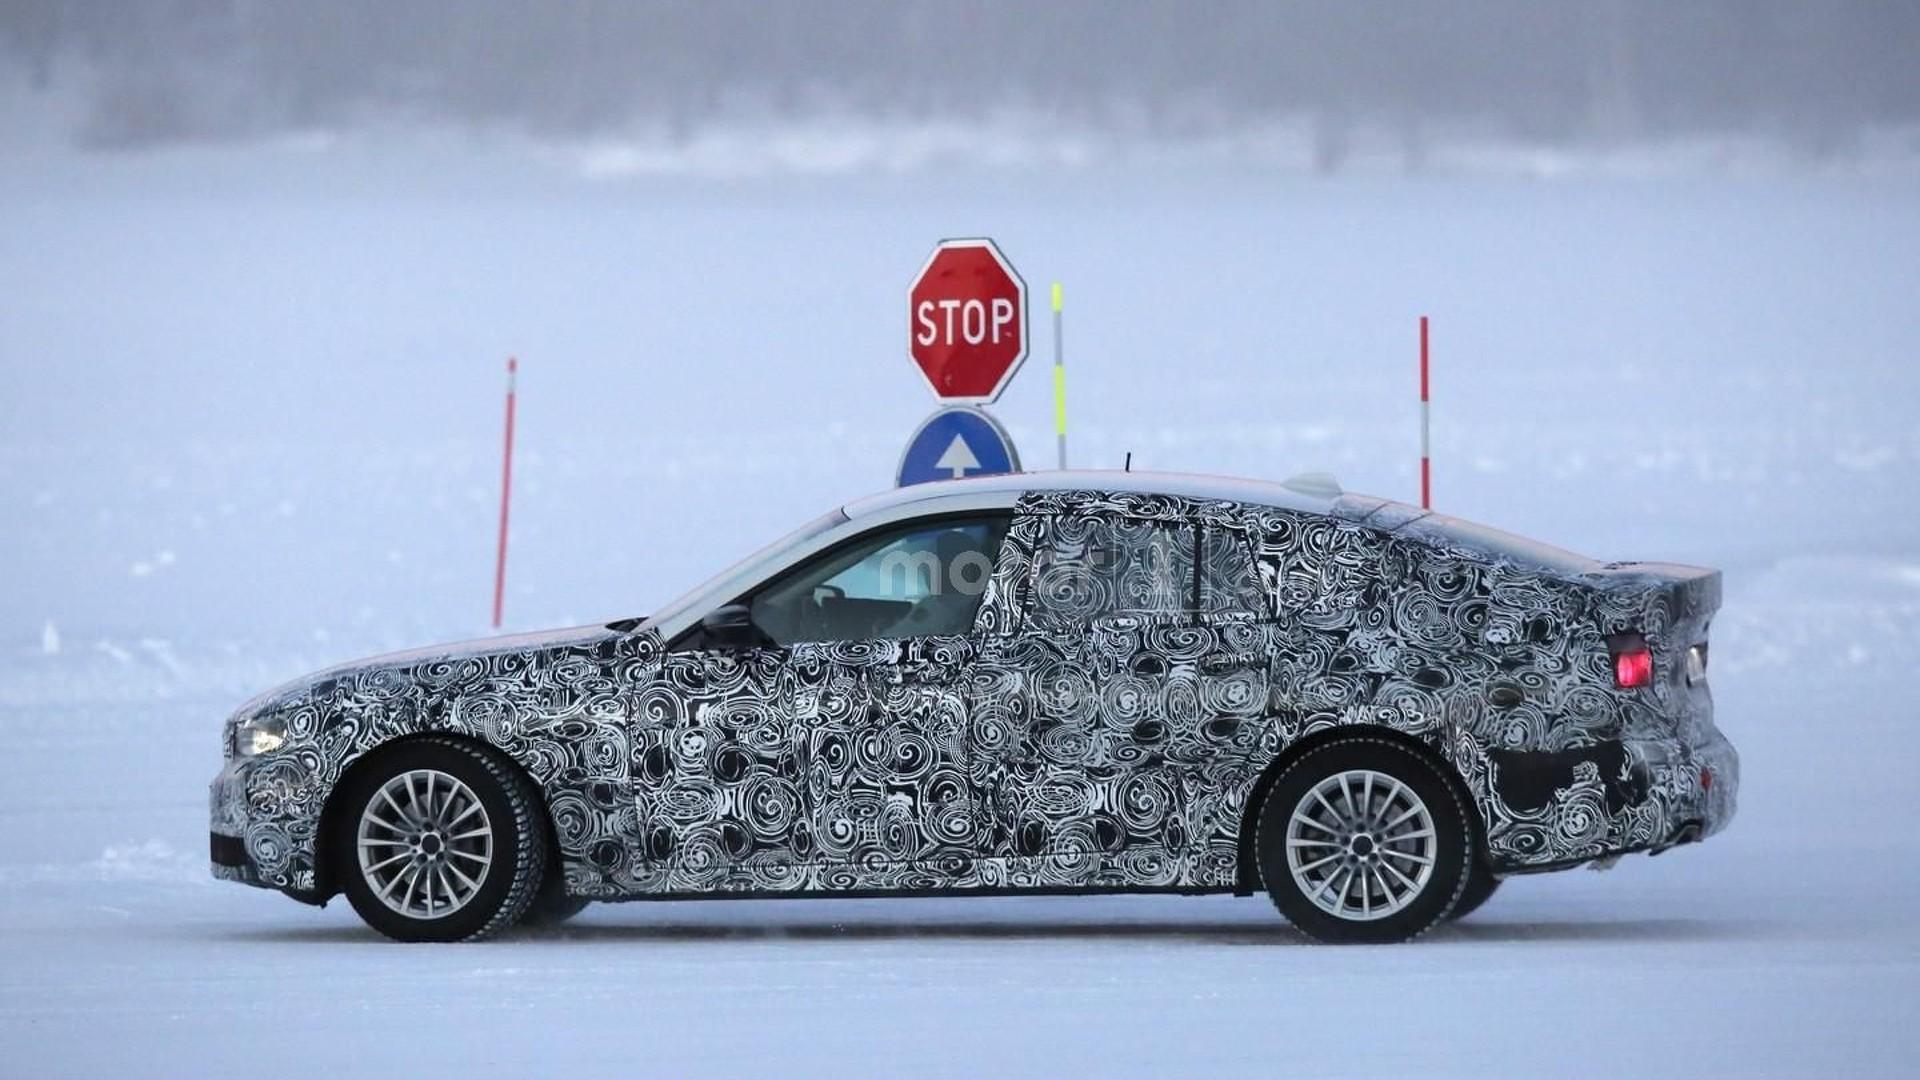 Spy pics remind us BMW is preparing new 5 Series GT